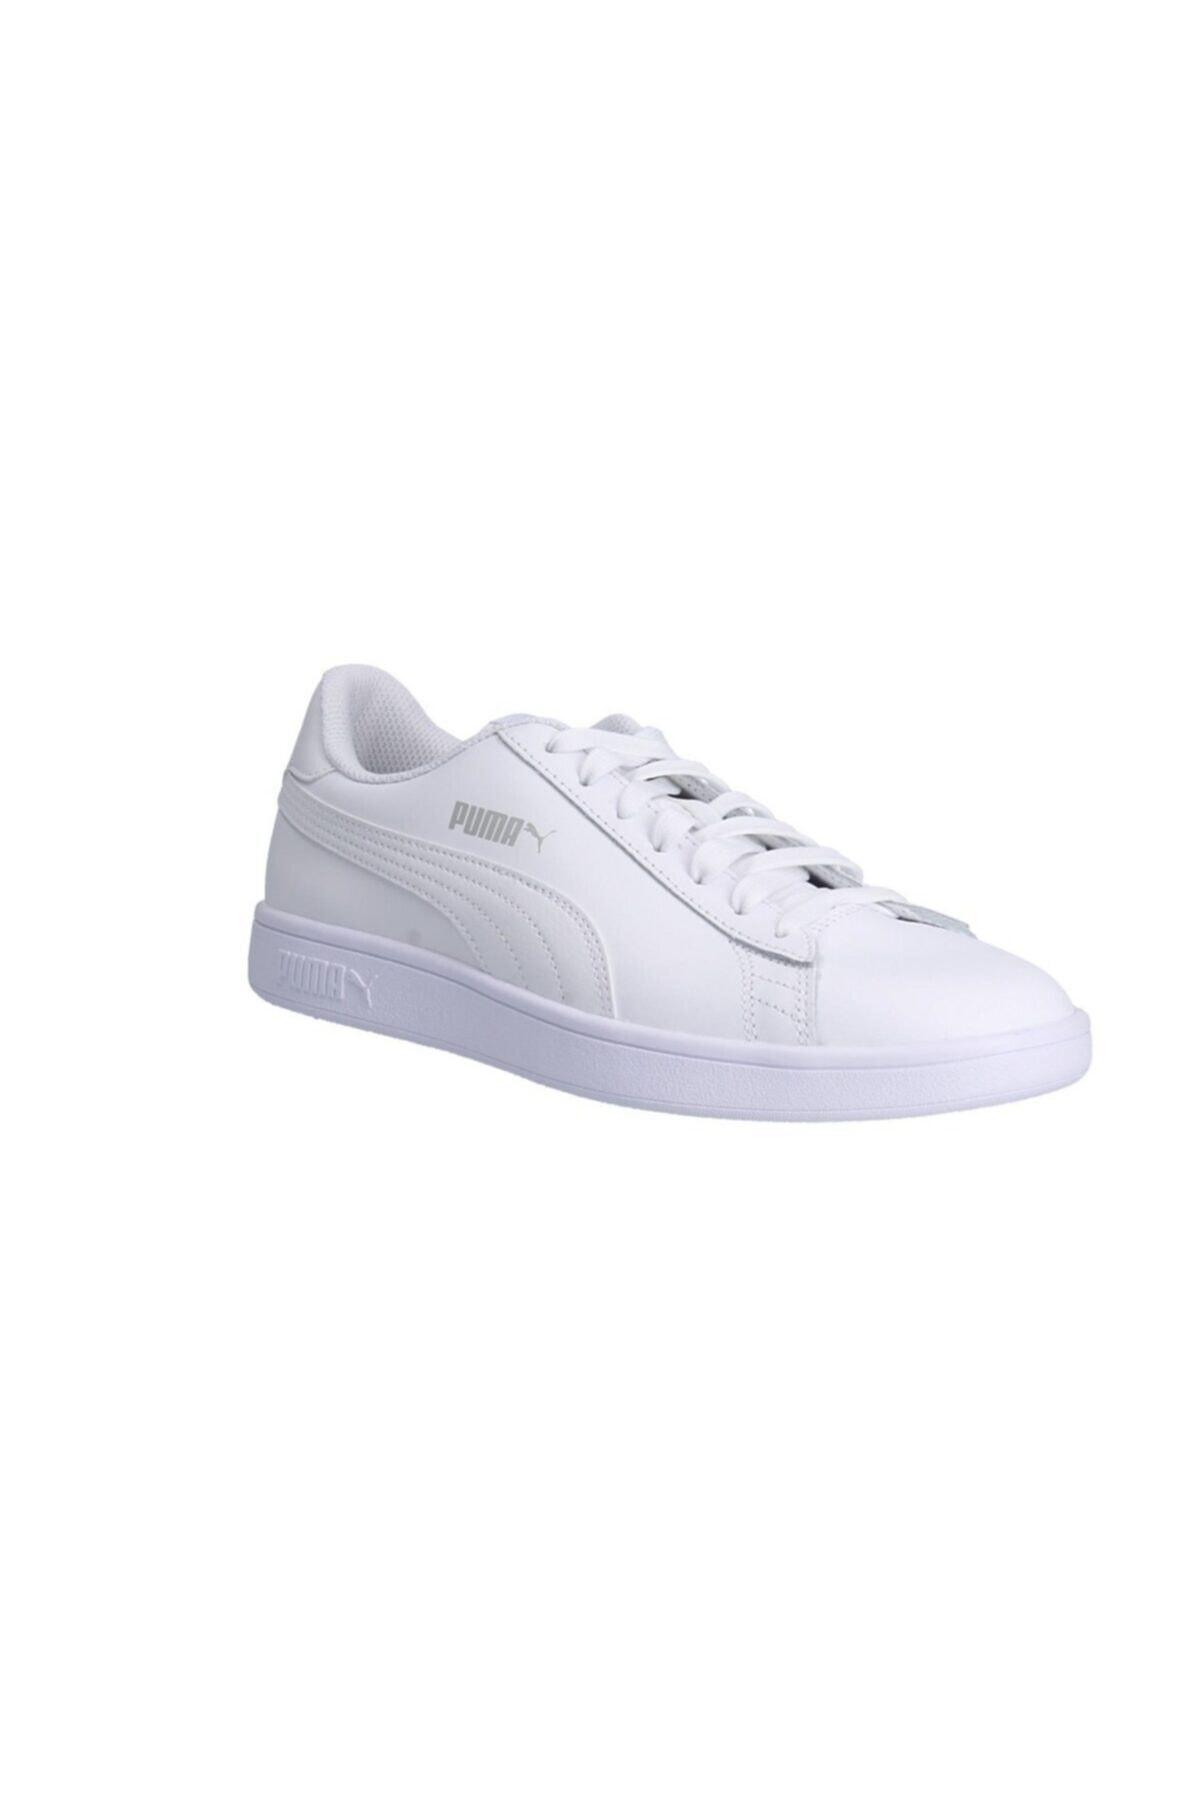 Puma SMASH V2 Beyaz Unisex Deri Sneaker 100323983 1